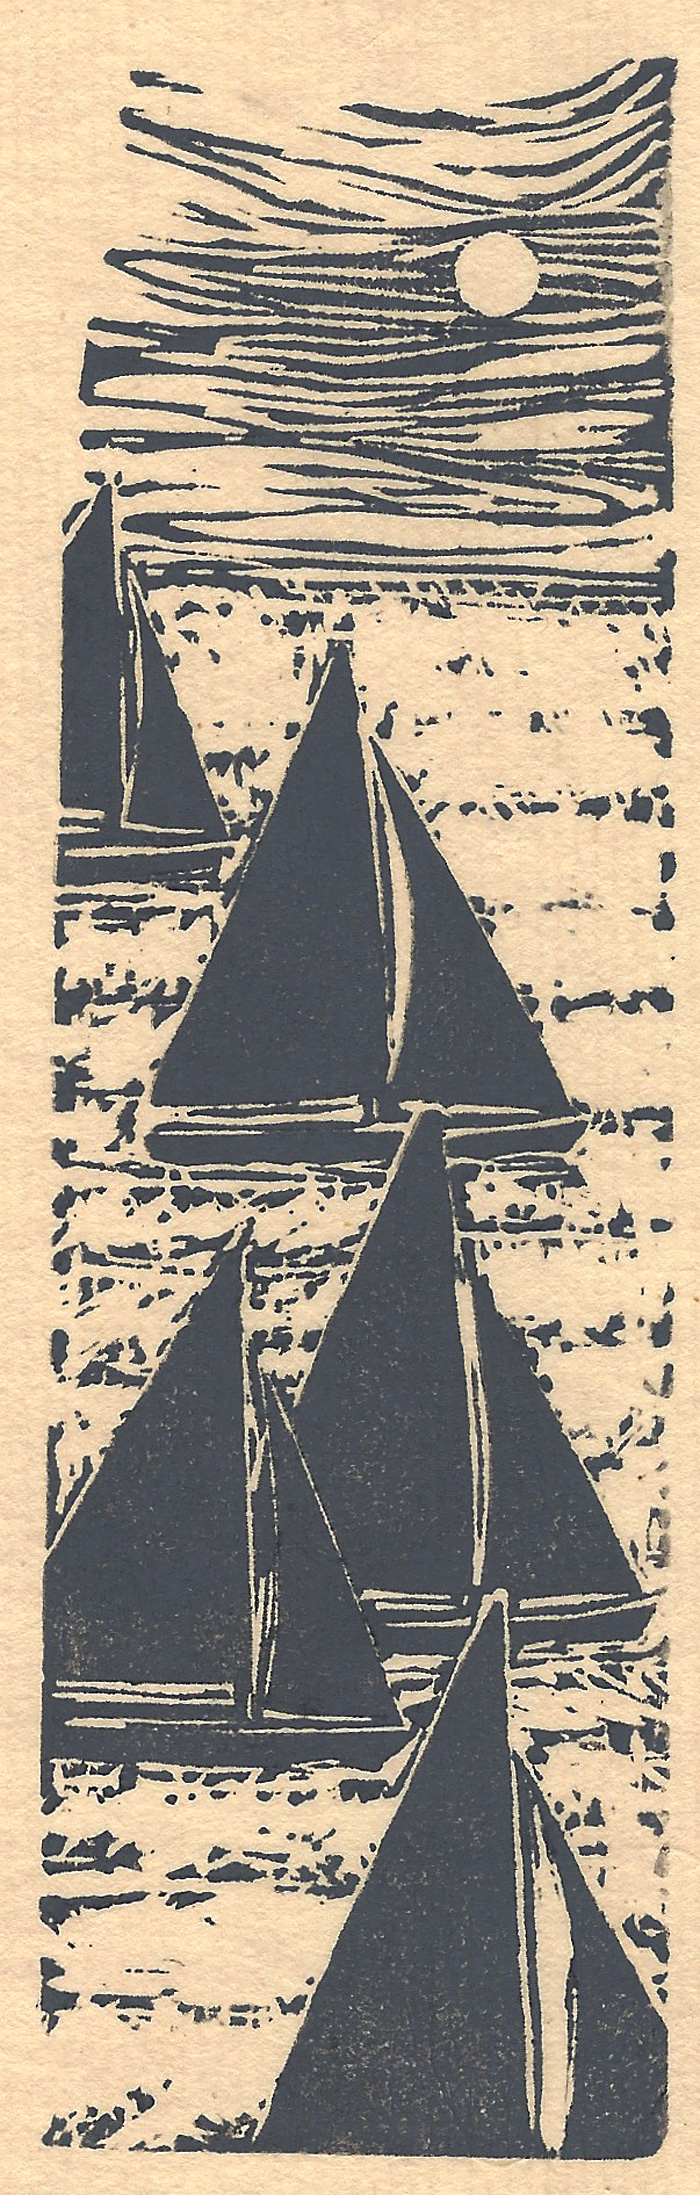 Sailing-Sketch-on-creme-paper